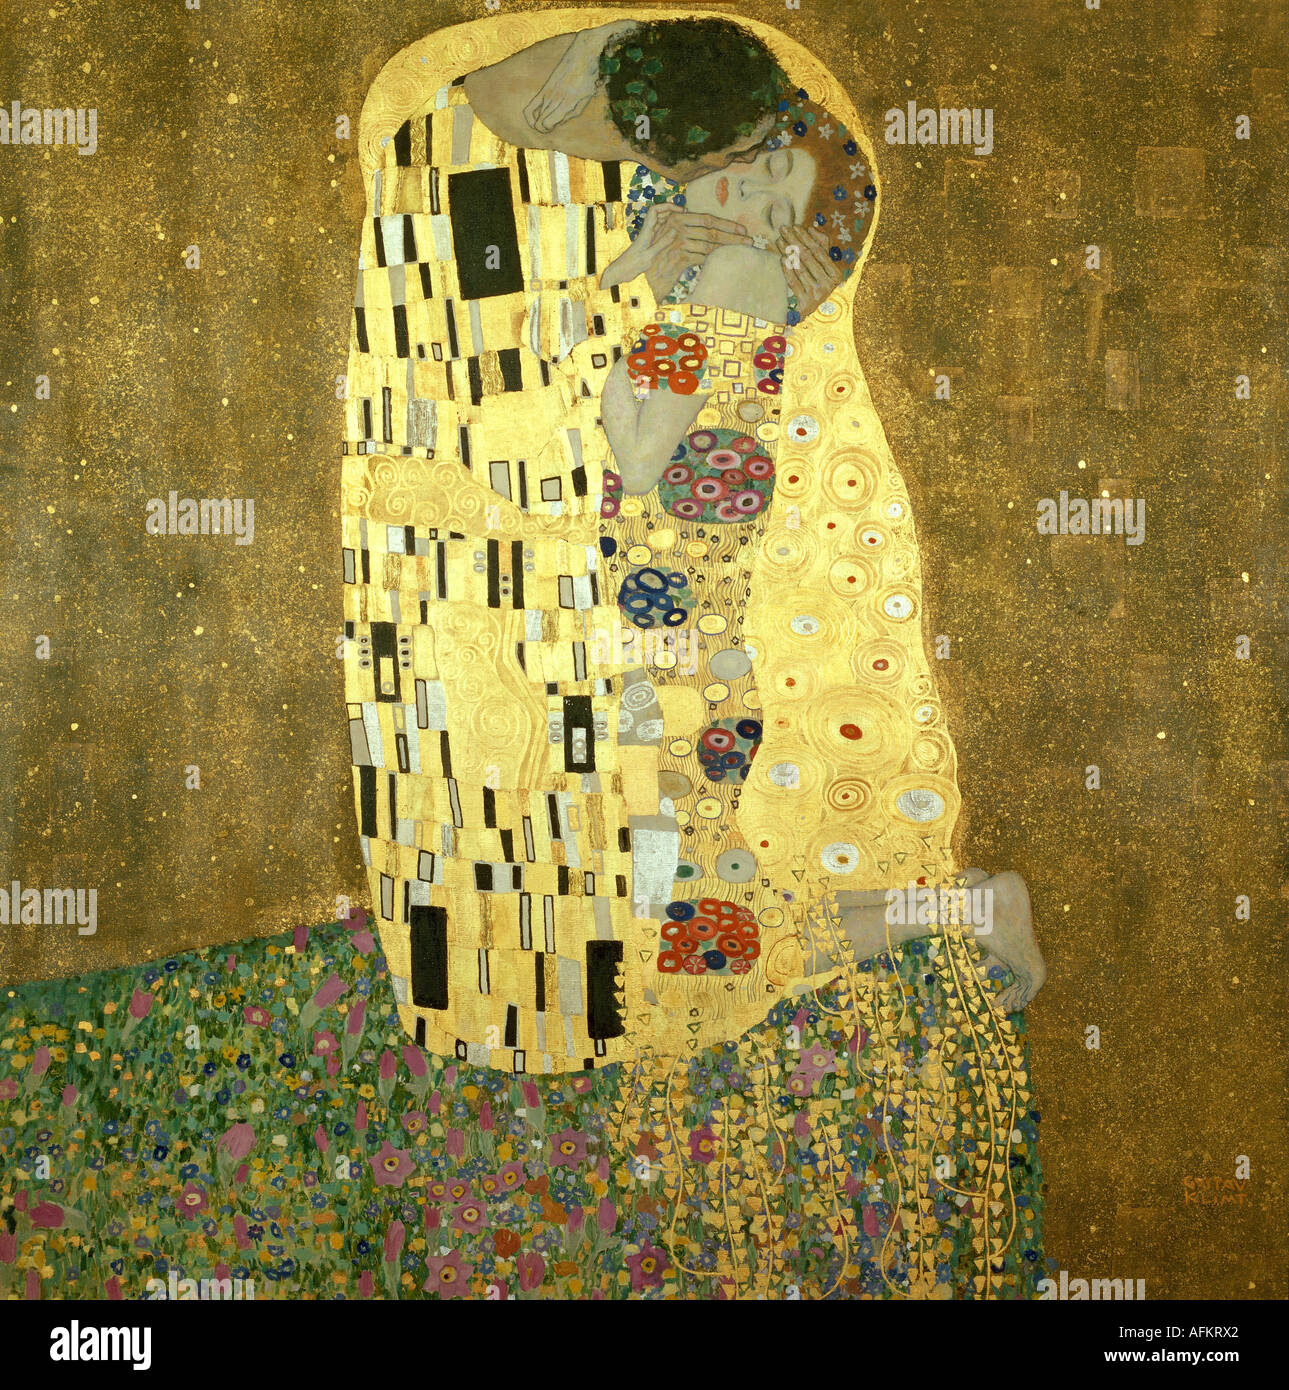 'Fine Arts, Klimt, Gustav, (1862 - 1918), peinture, 'Der Kuss', ('le kiss'), 1907 - 1908, huile, Photo Stock